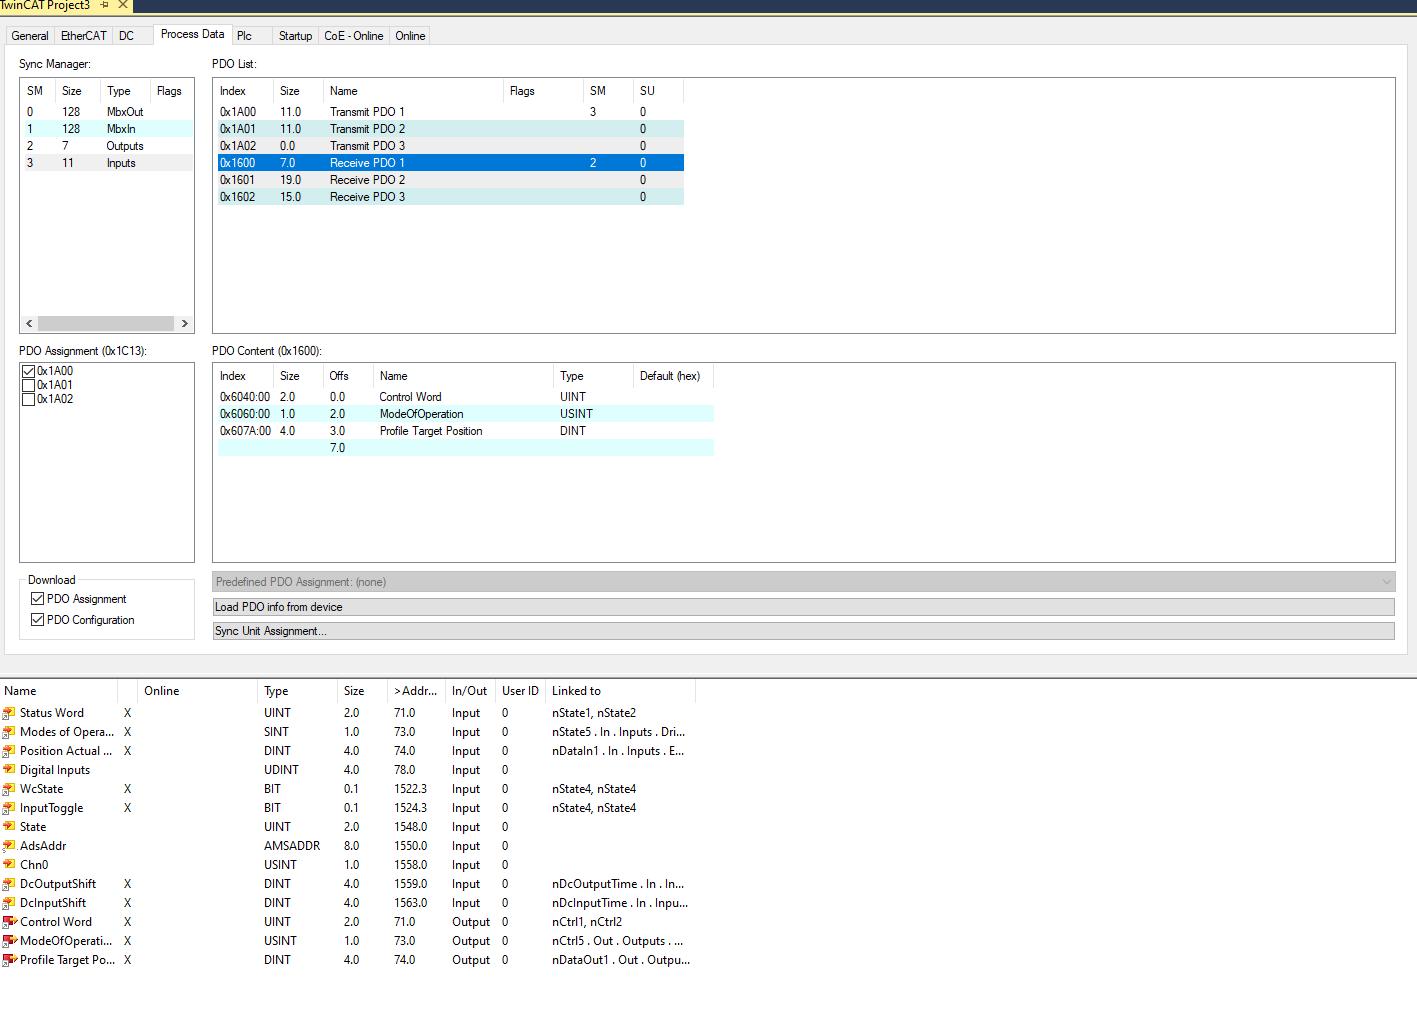 processdataPDOs_2020-05-22.png